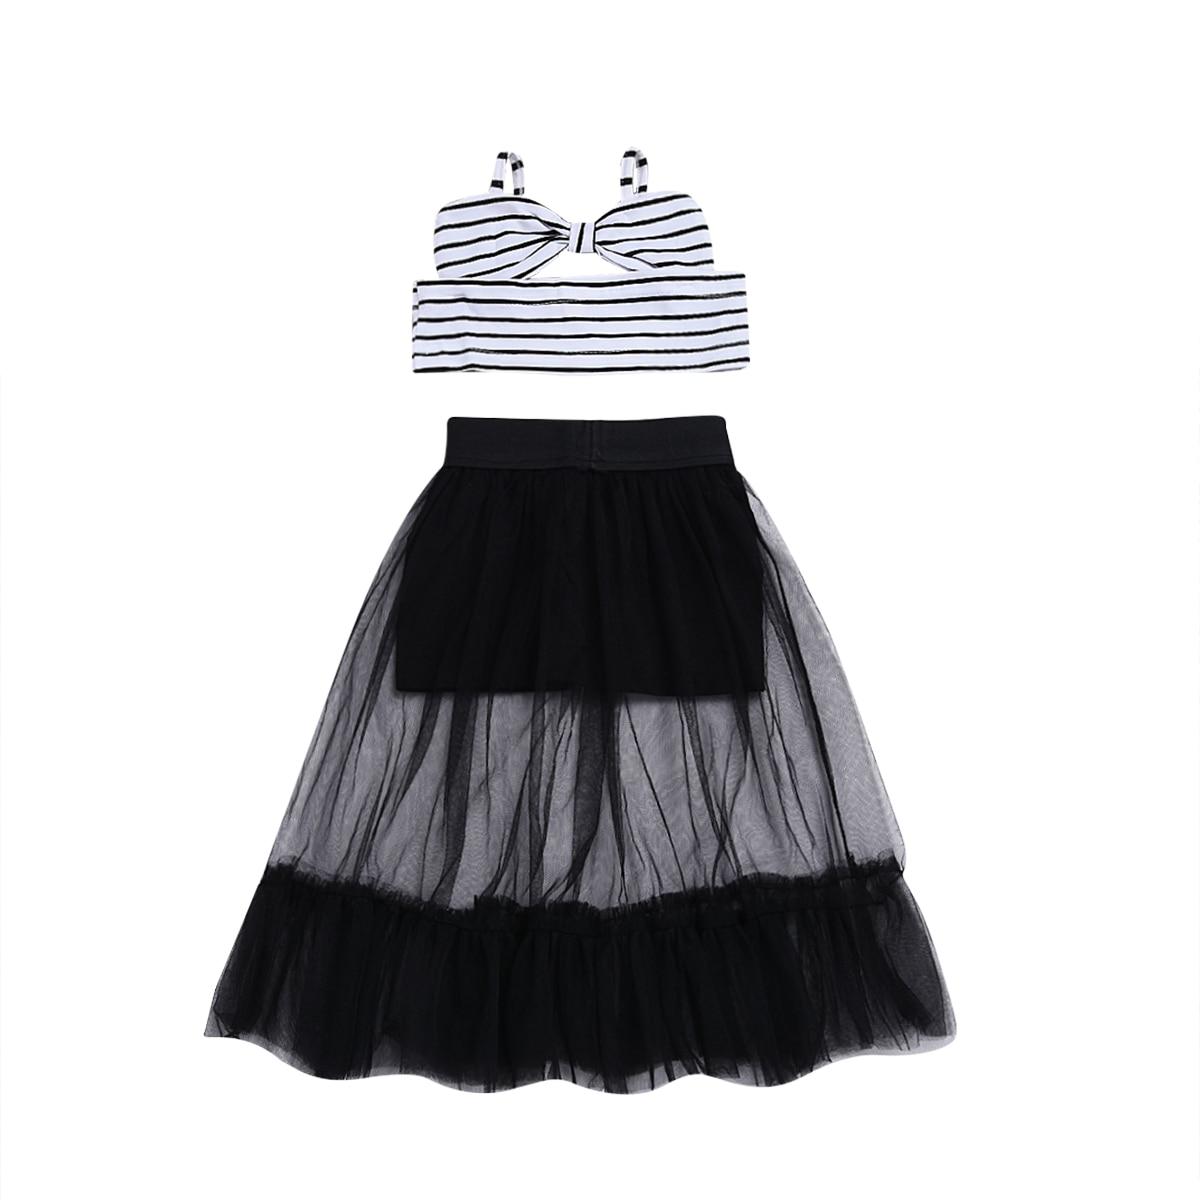 Kids Baby Girl Stripe Off Shoulder Crop Top Striped Tops Tulle Tutu Skirt Dress Outfit Toddler Girl Summer Clothing Set